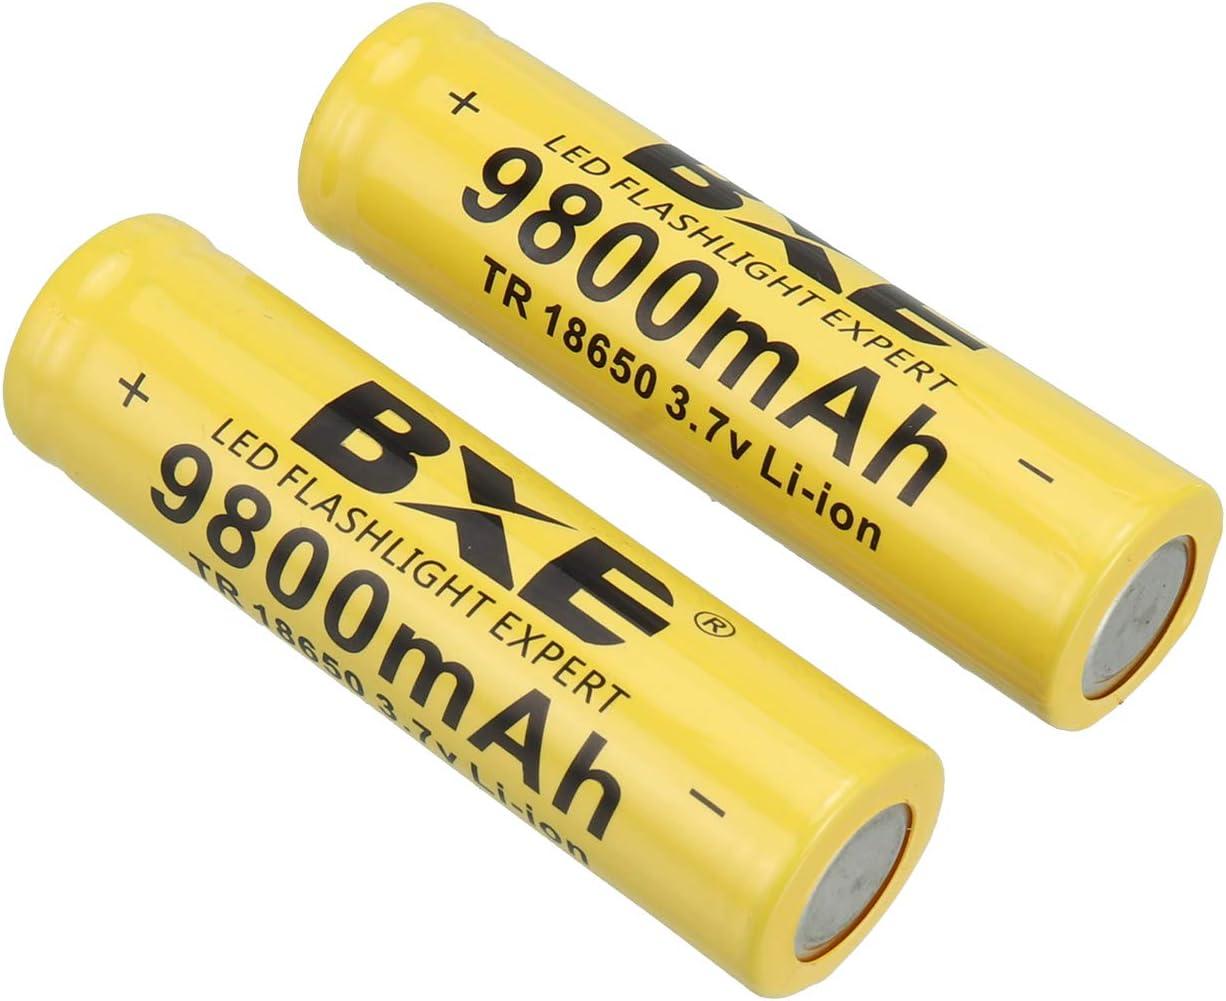 9800mAh Li-ion 3.7V Rechargeable Batteries for Flashlight Headlamp 4X Batteries18650 Battery button top